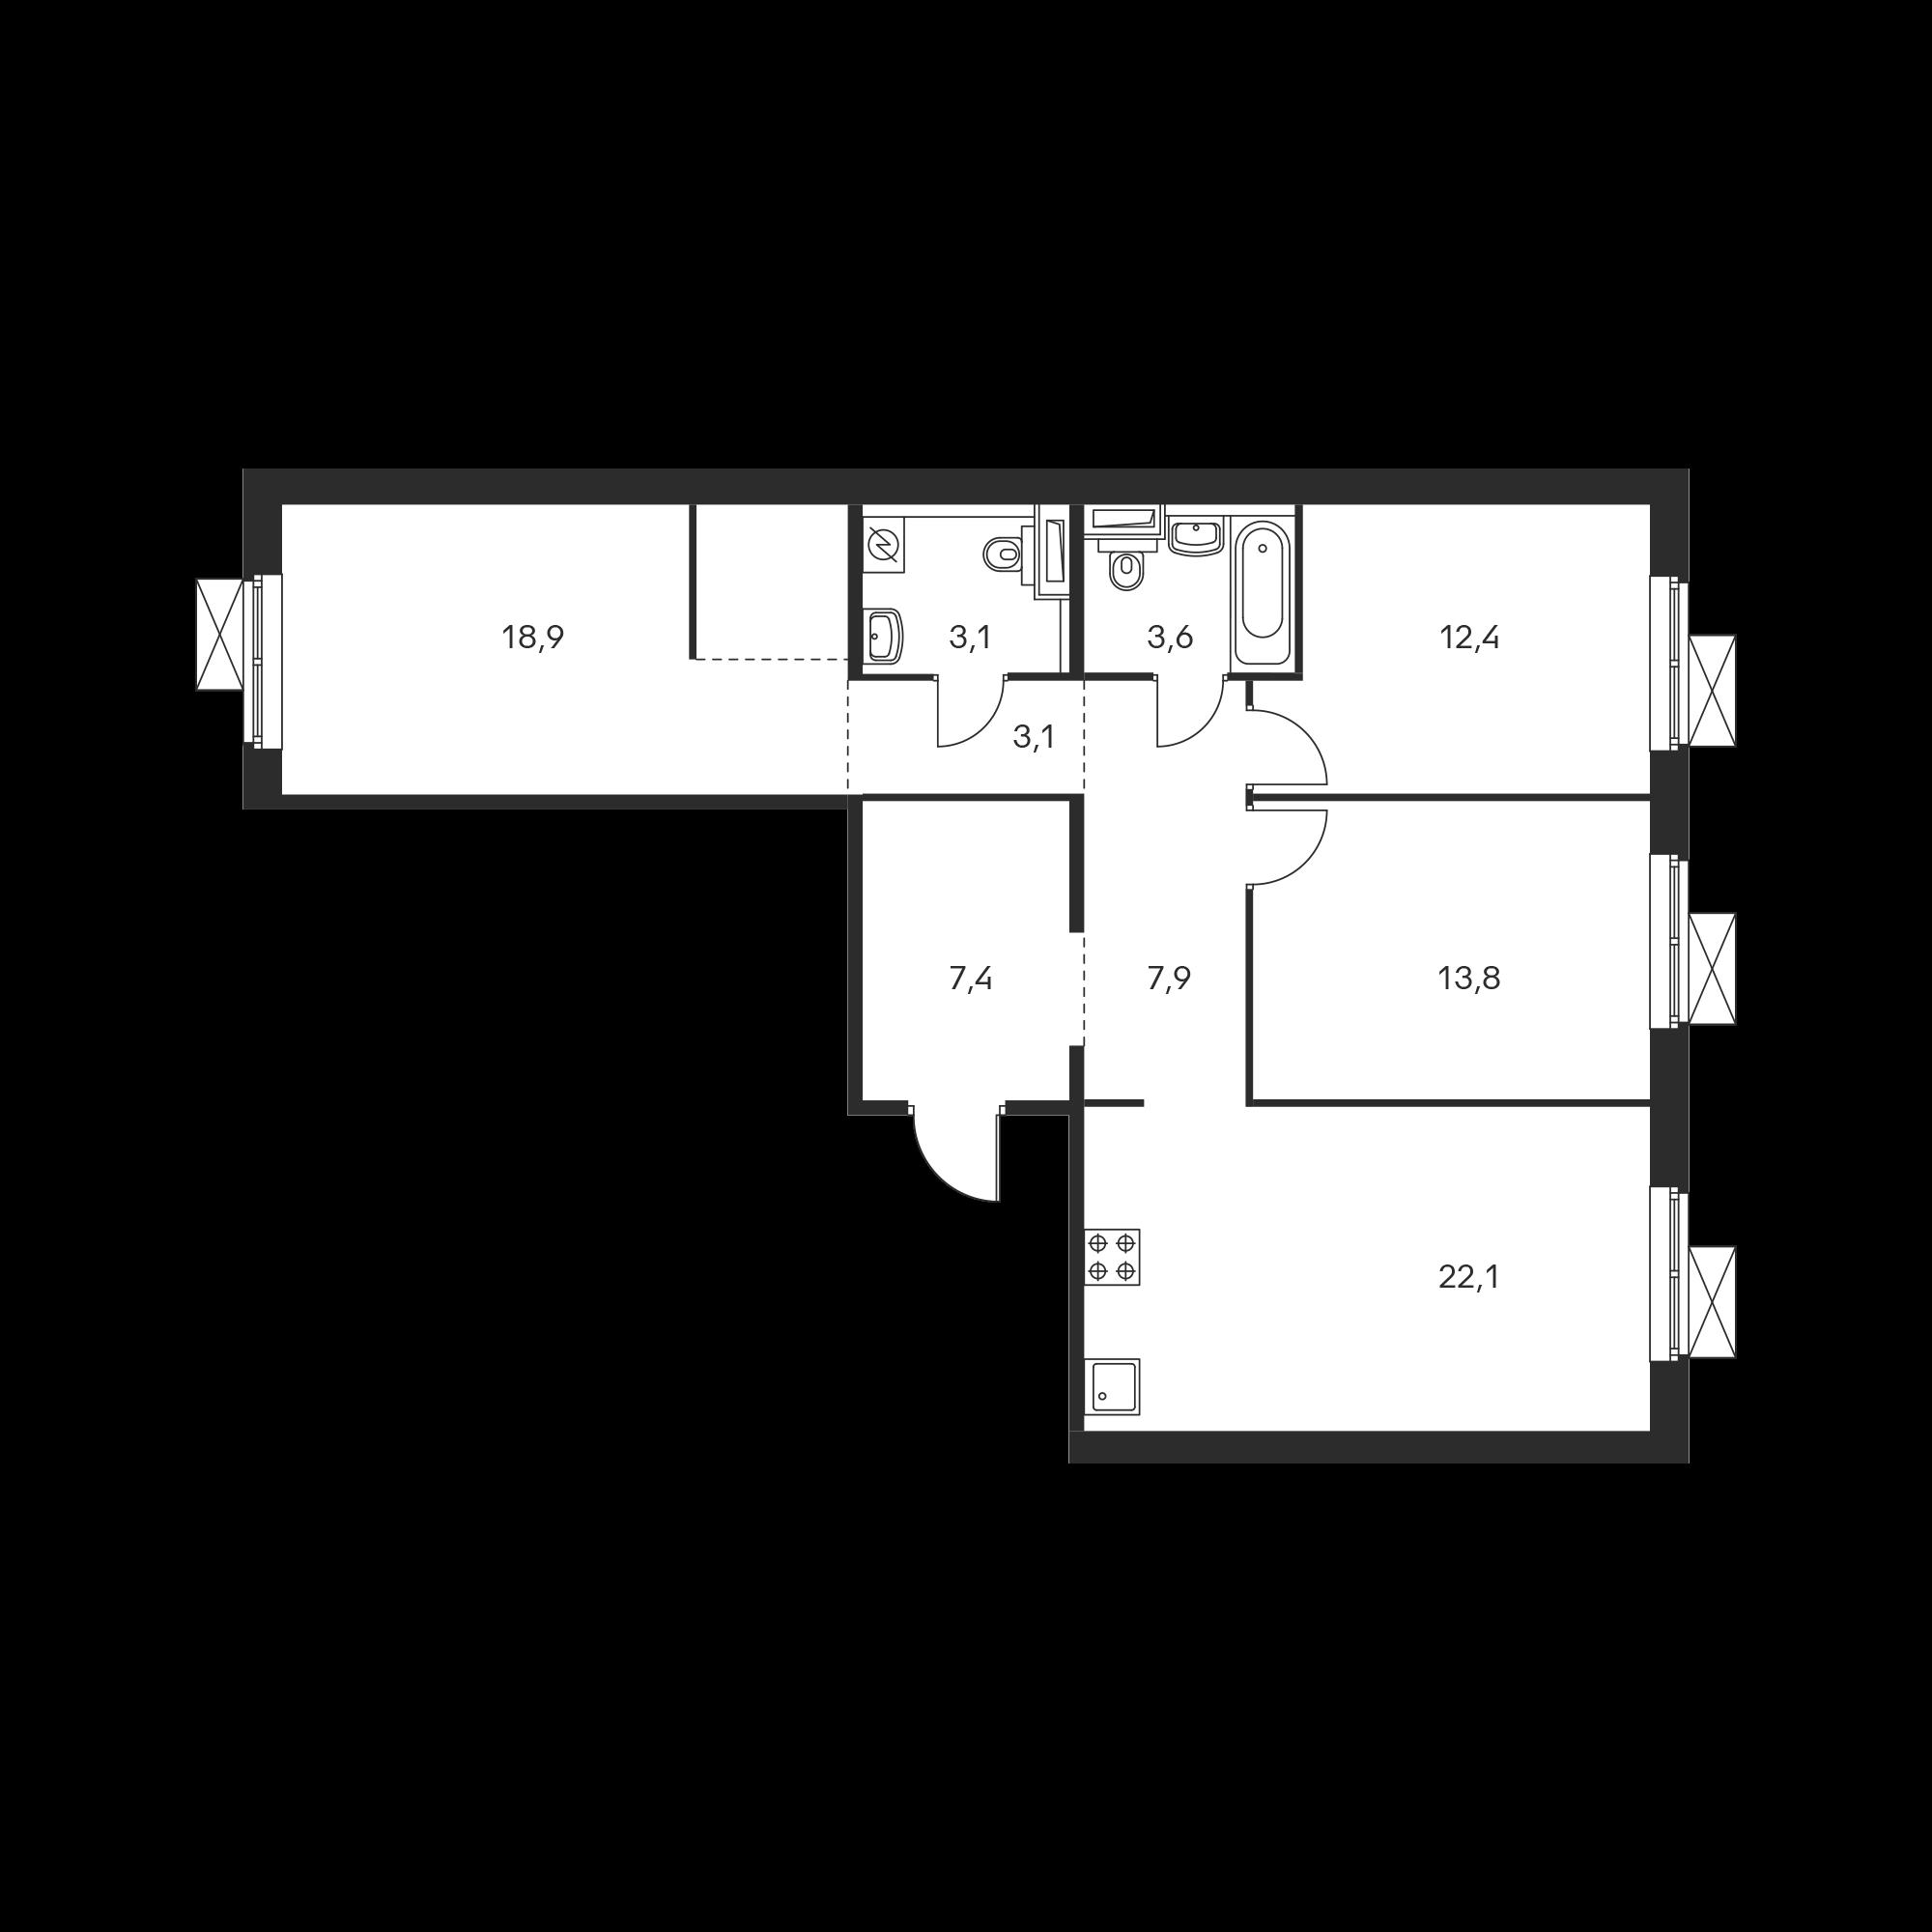 3EL3_10.2-2